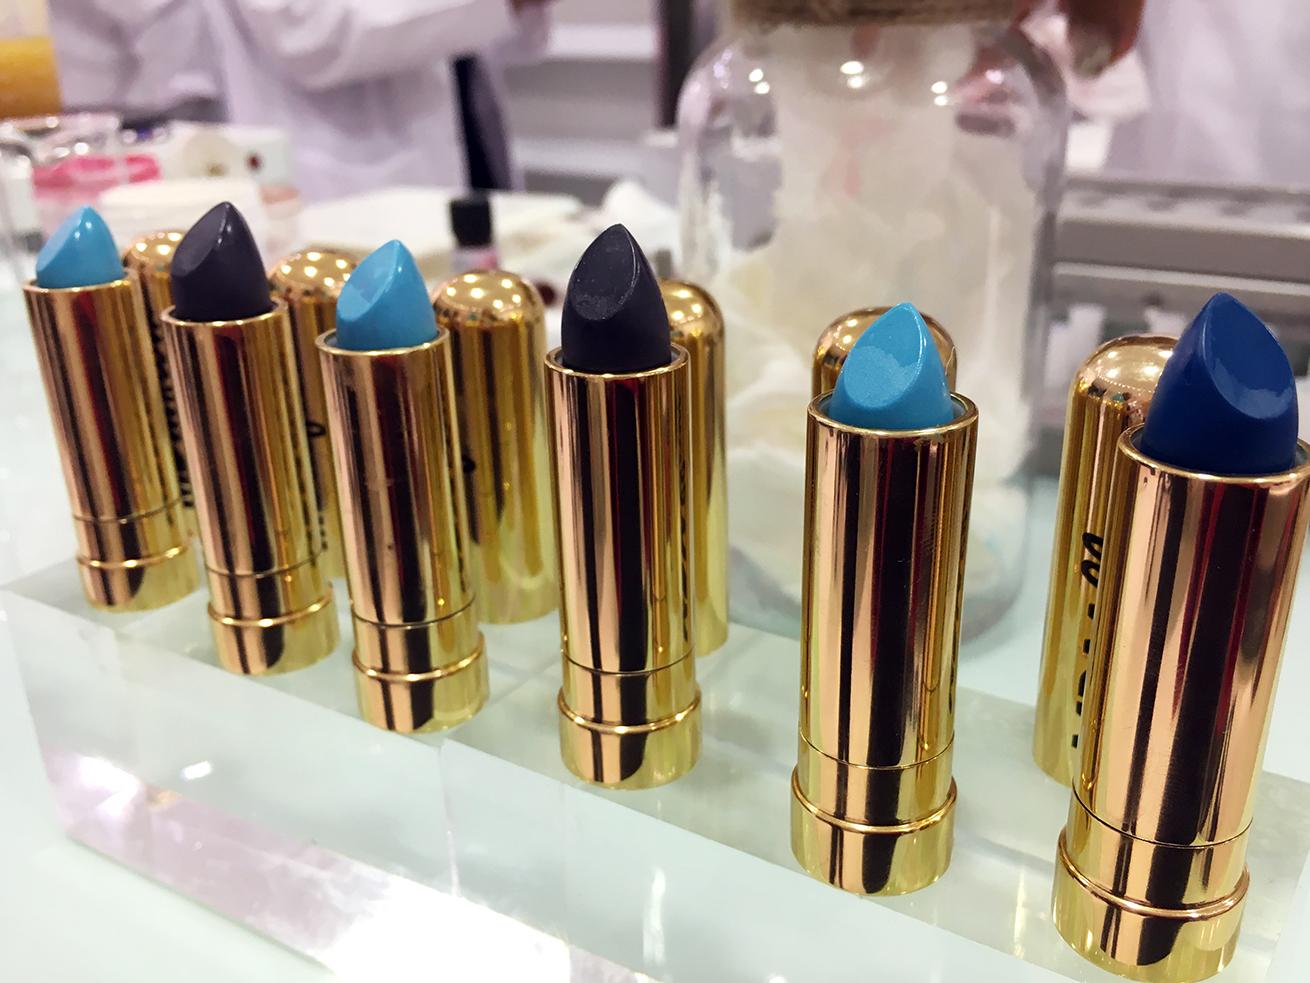 blue, navy, black lipstick MDMFlow